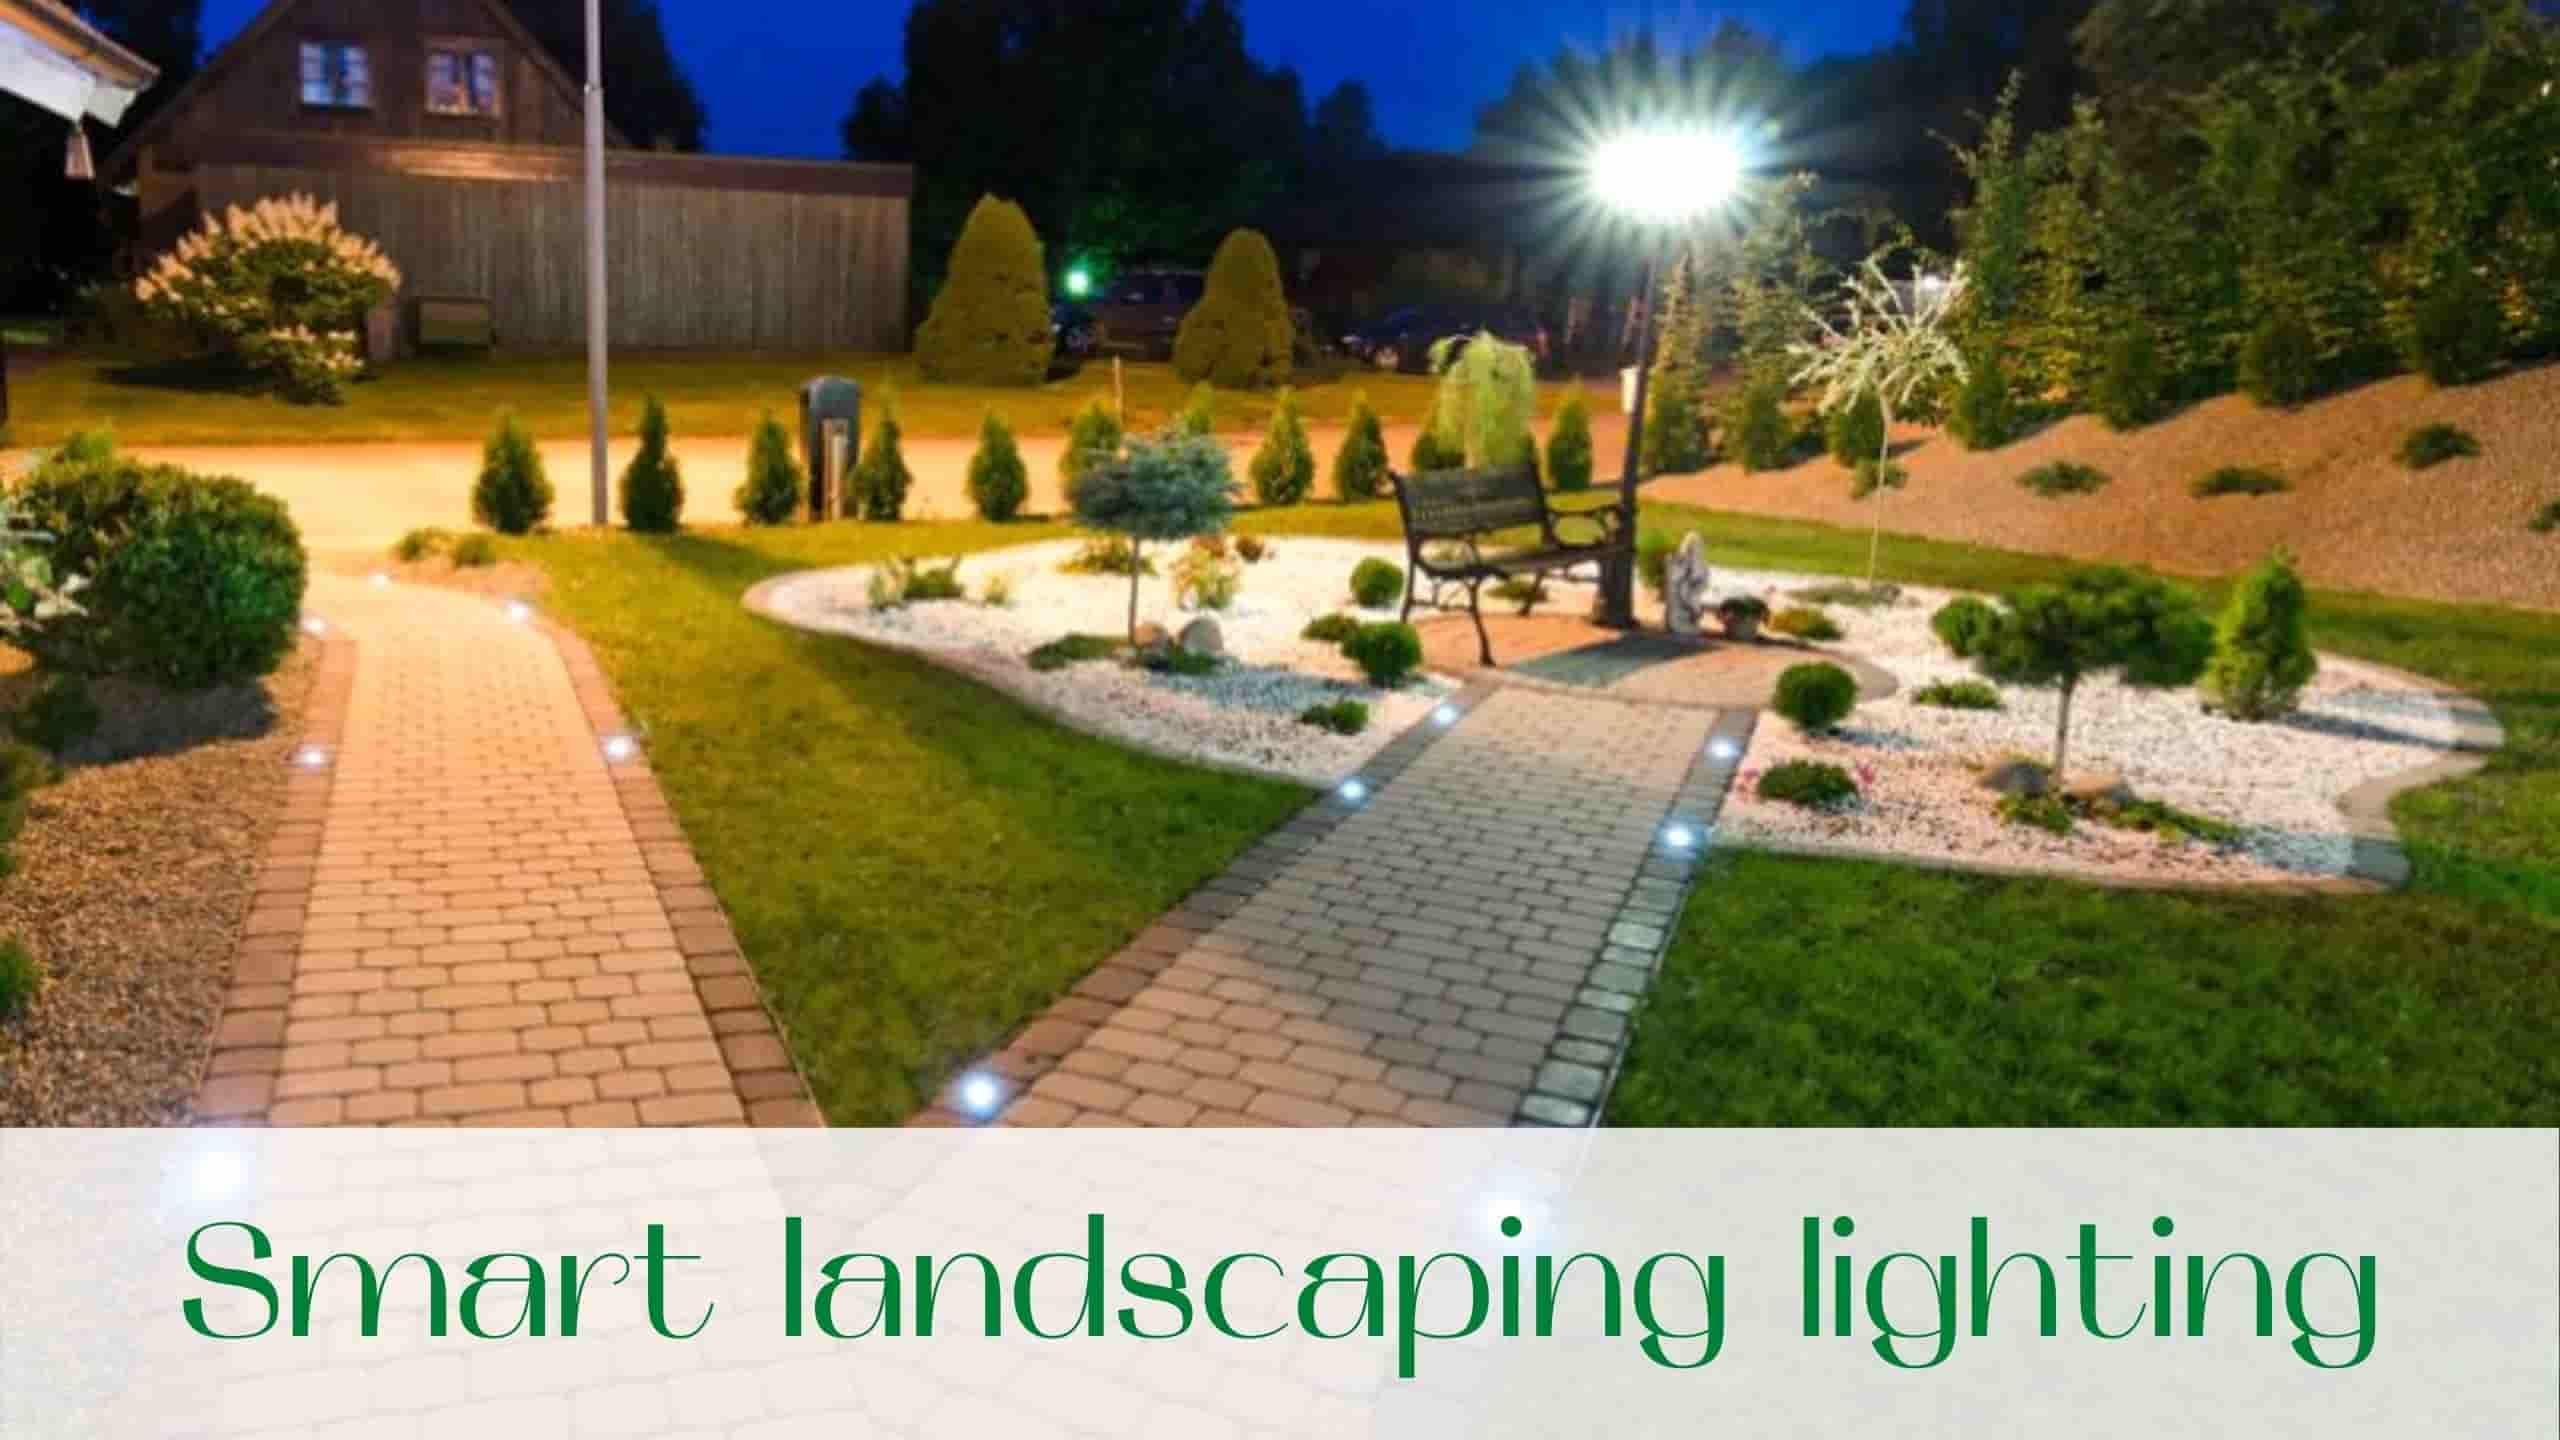 image-smart-landscaping-lighting-in-Toronto